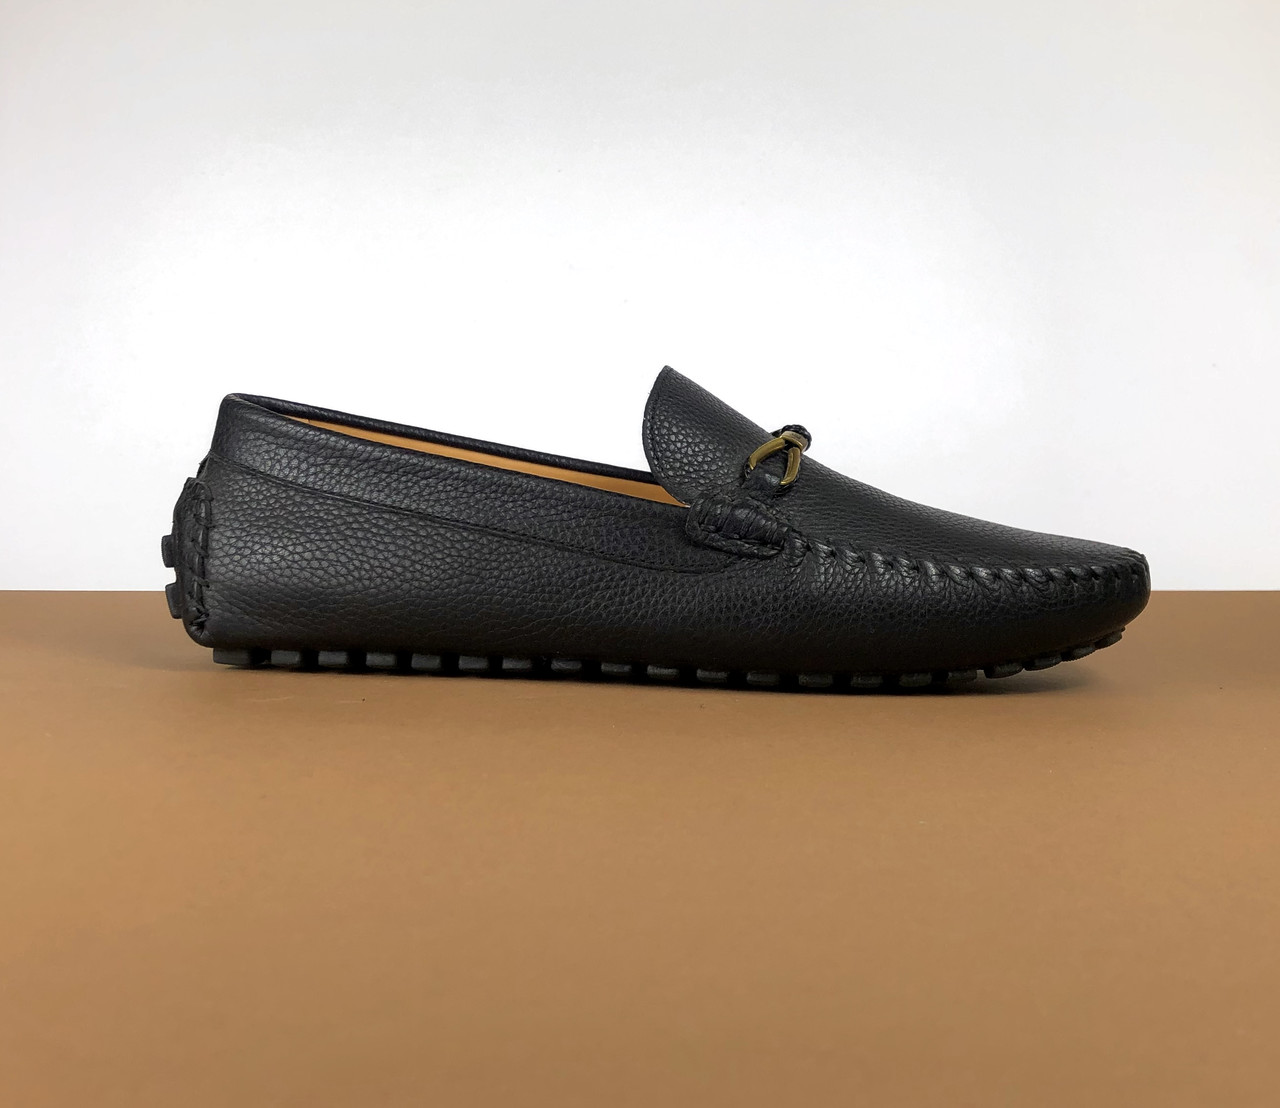 Мокасины Louis Vuitton черные (Луи Виттон) арт. 39-25